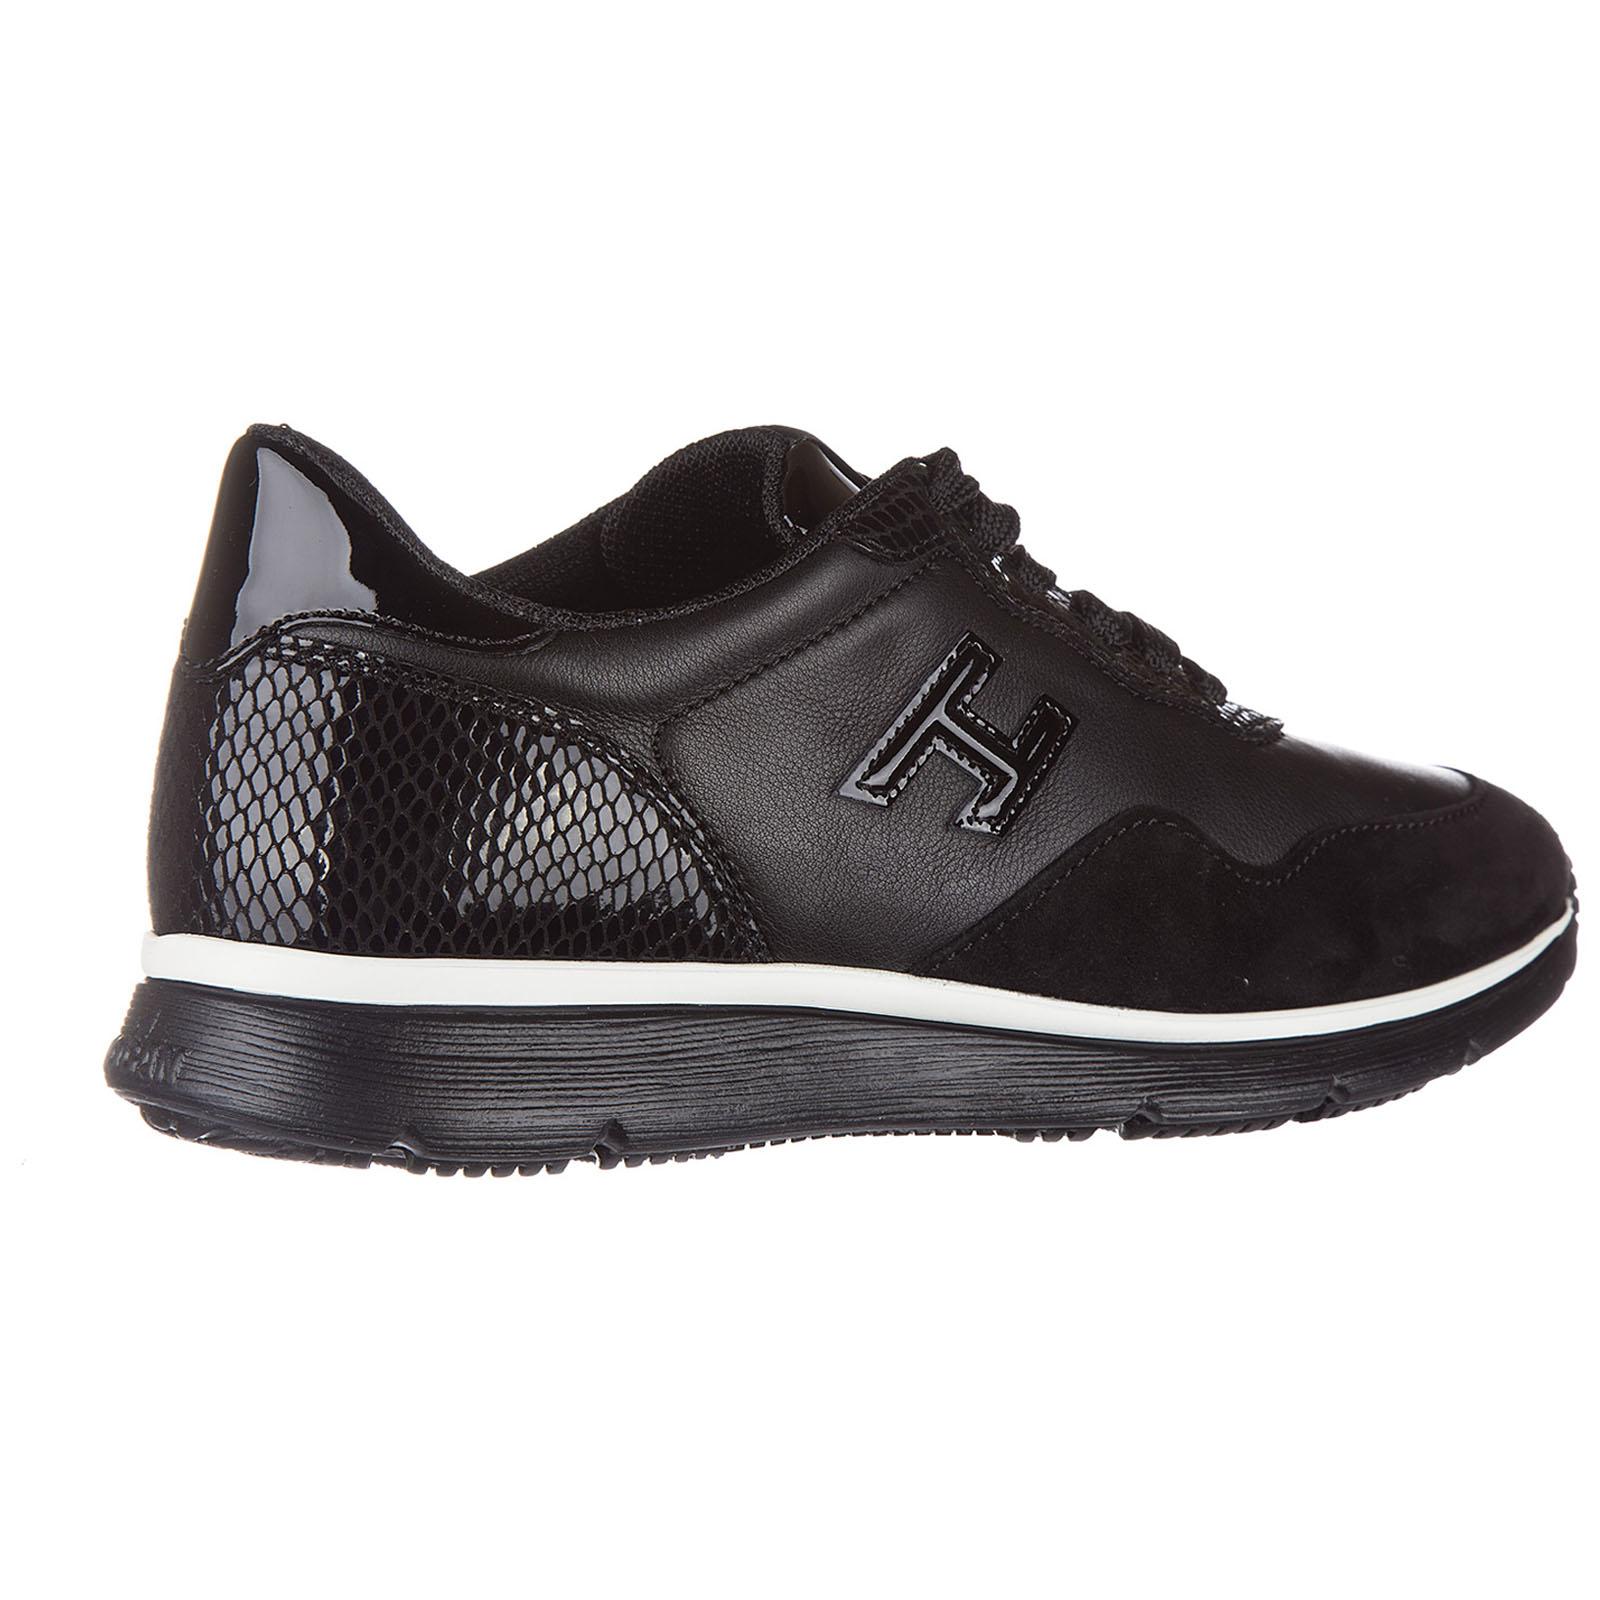 ... Scarpe sneakers donna in pelle h254 traditional 2015 ... 39090511f8e